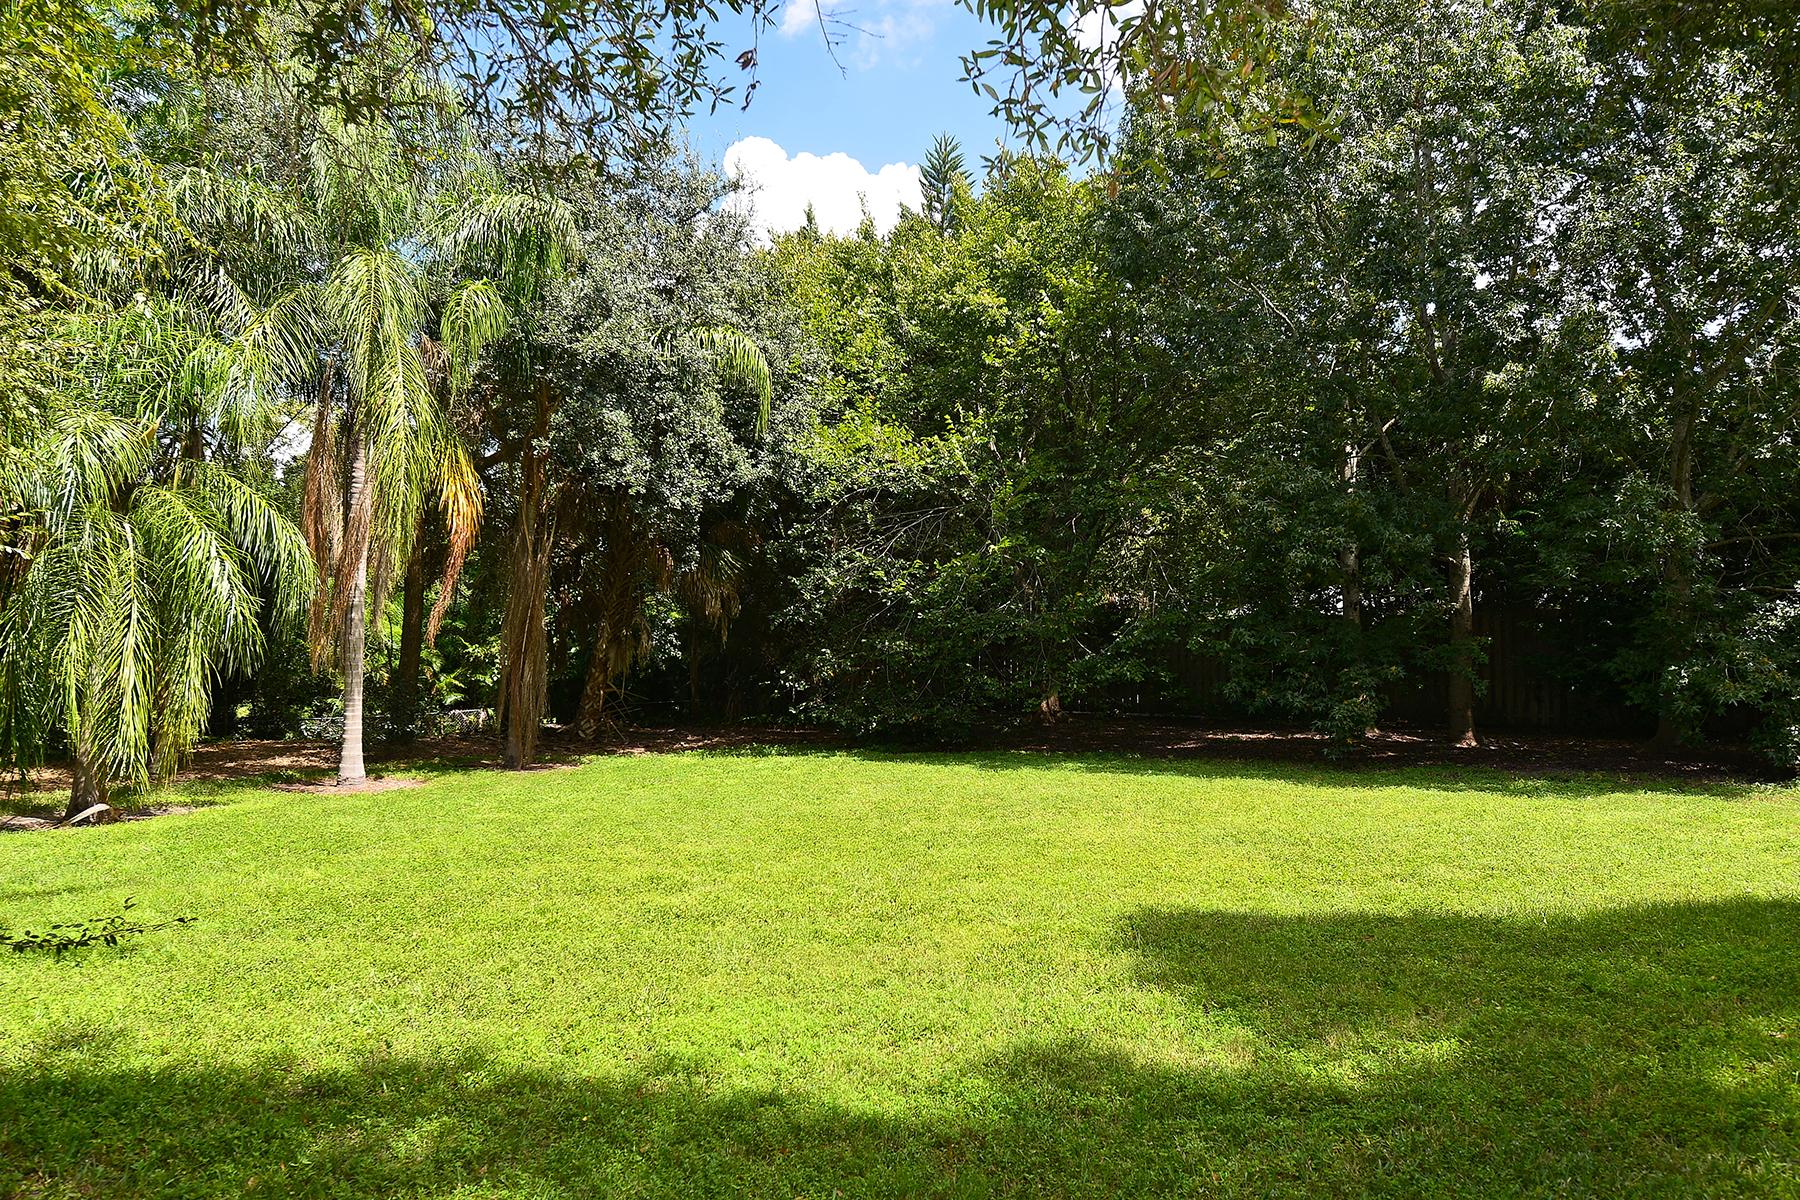 Land for Sale at FIELD CLUB Ivanhoe St 0 Sarasota, Florida, 34231 United States